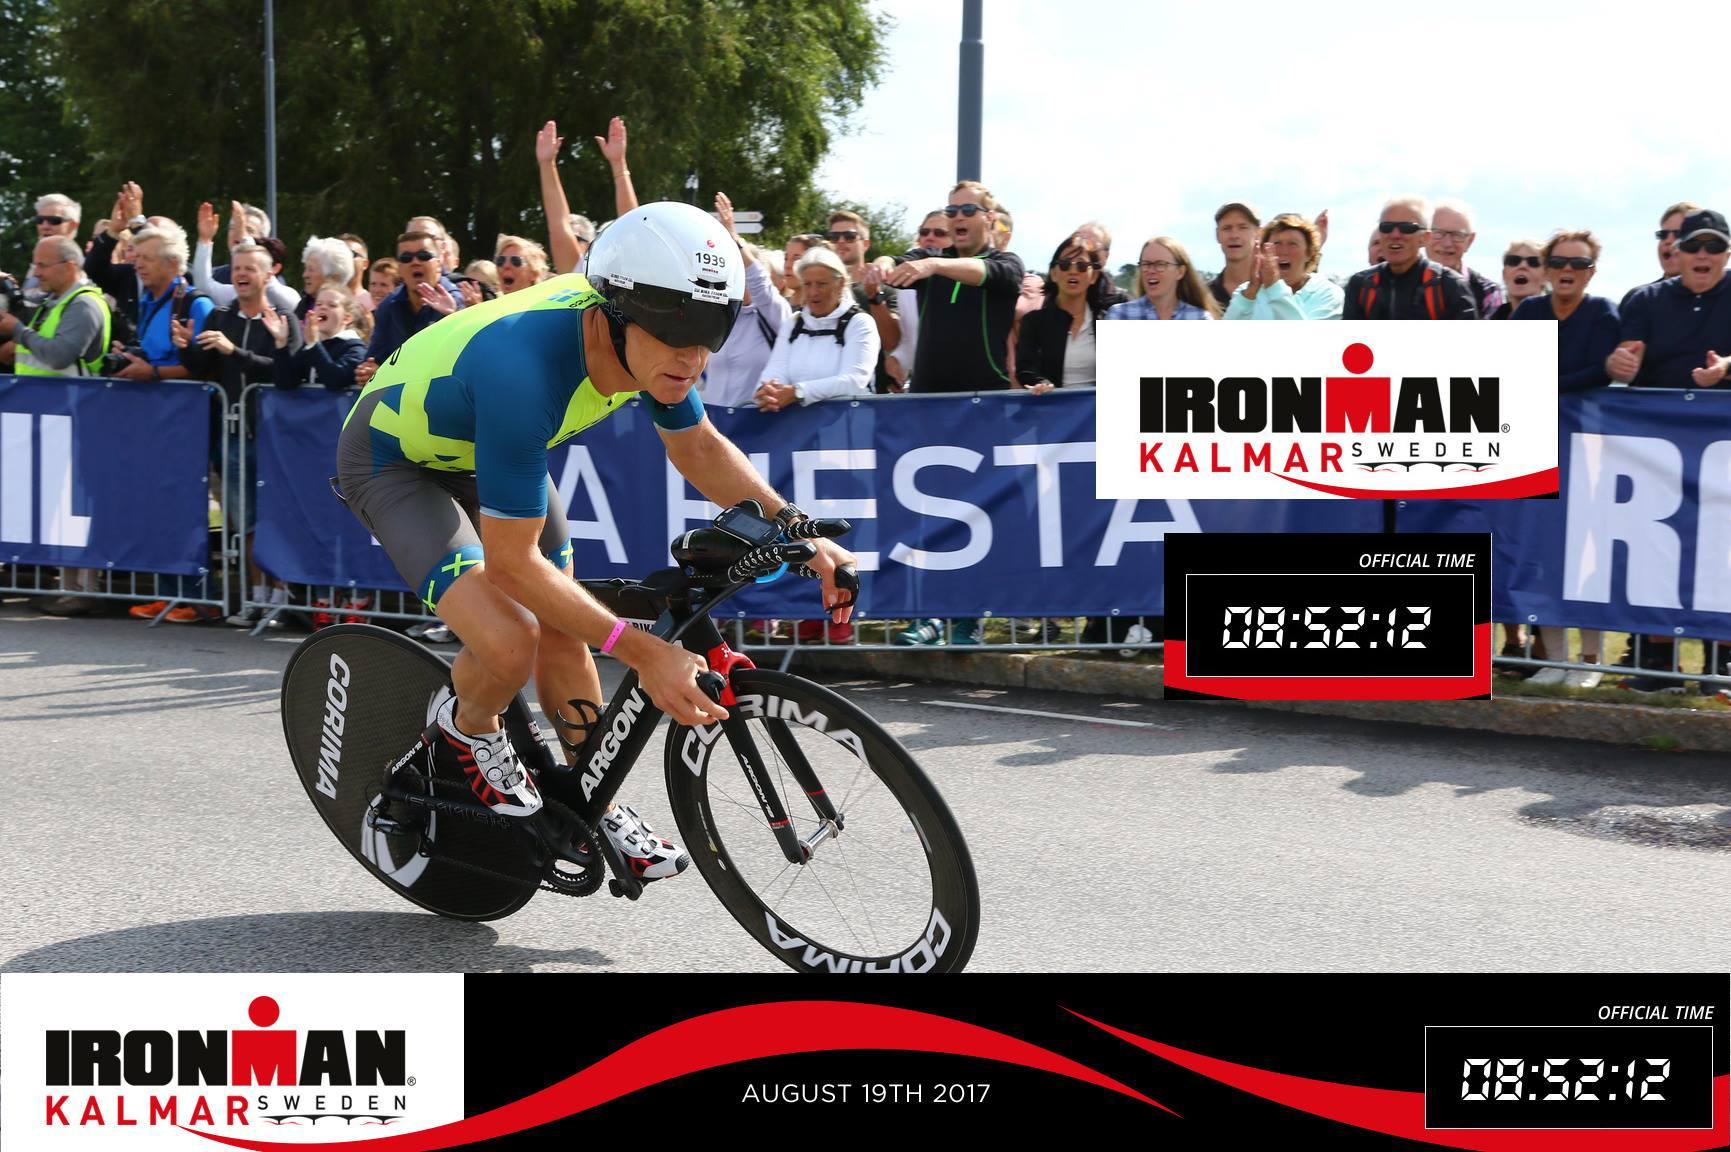 Carl Brummer Ironmanstatistik